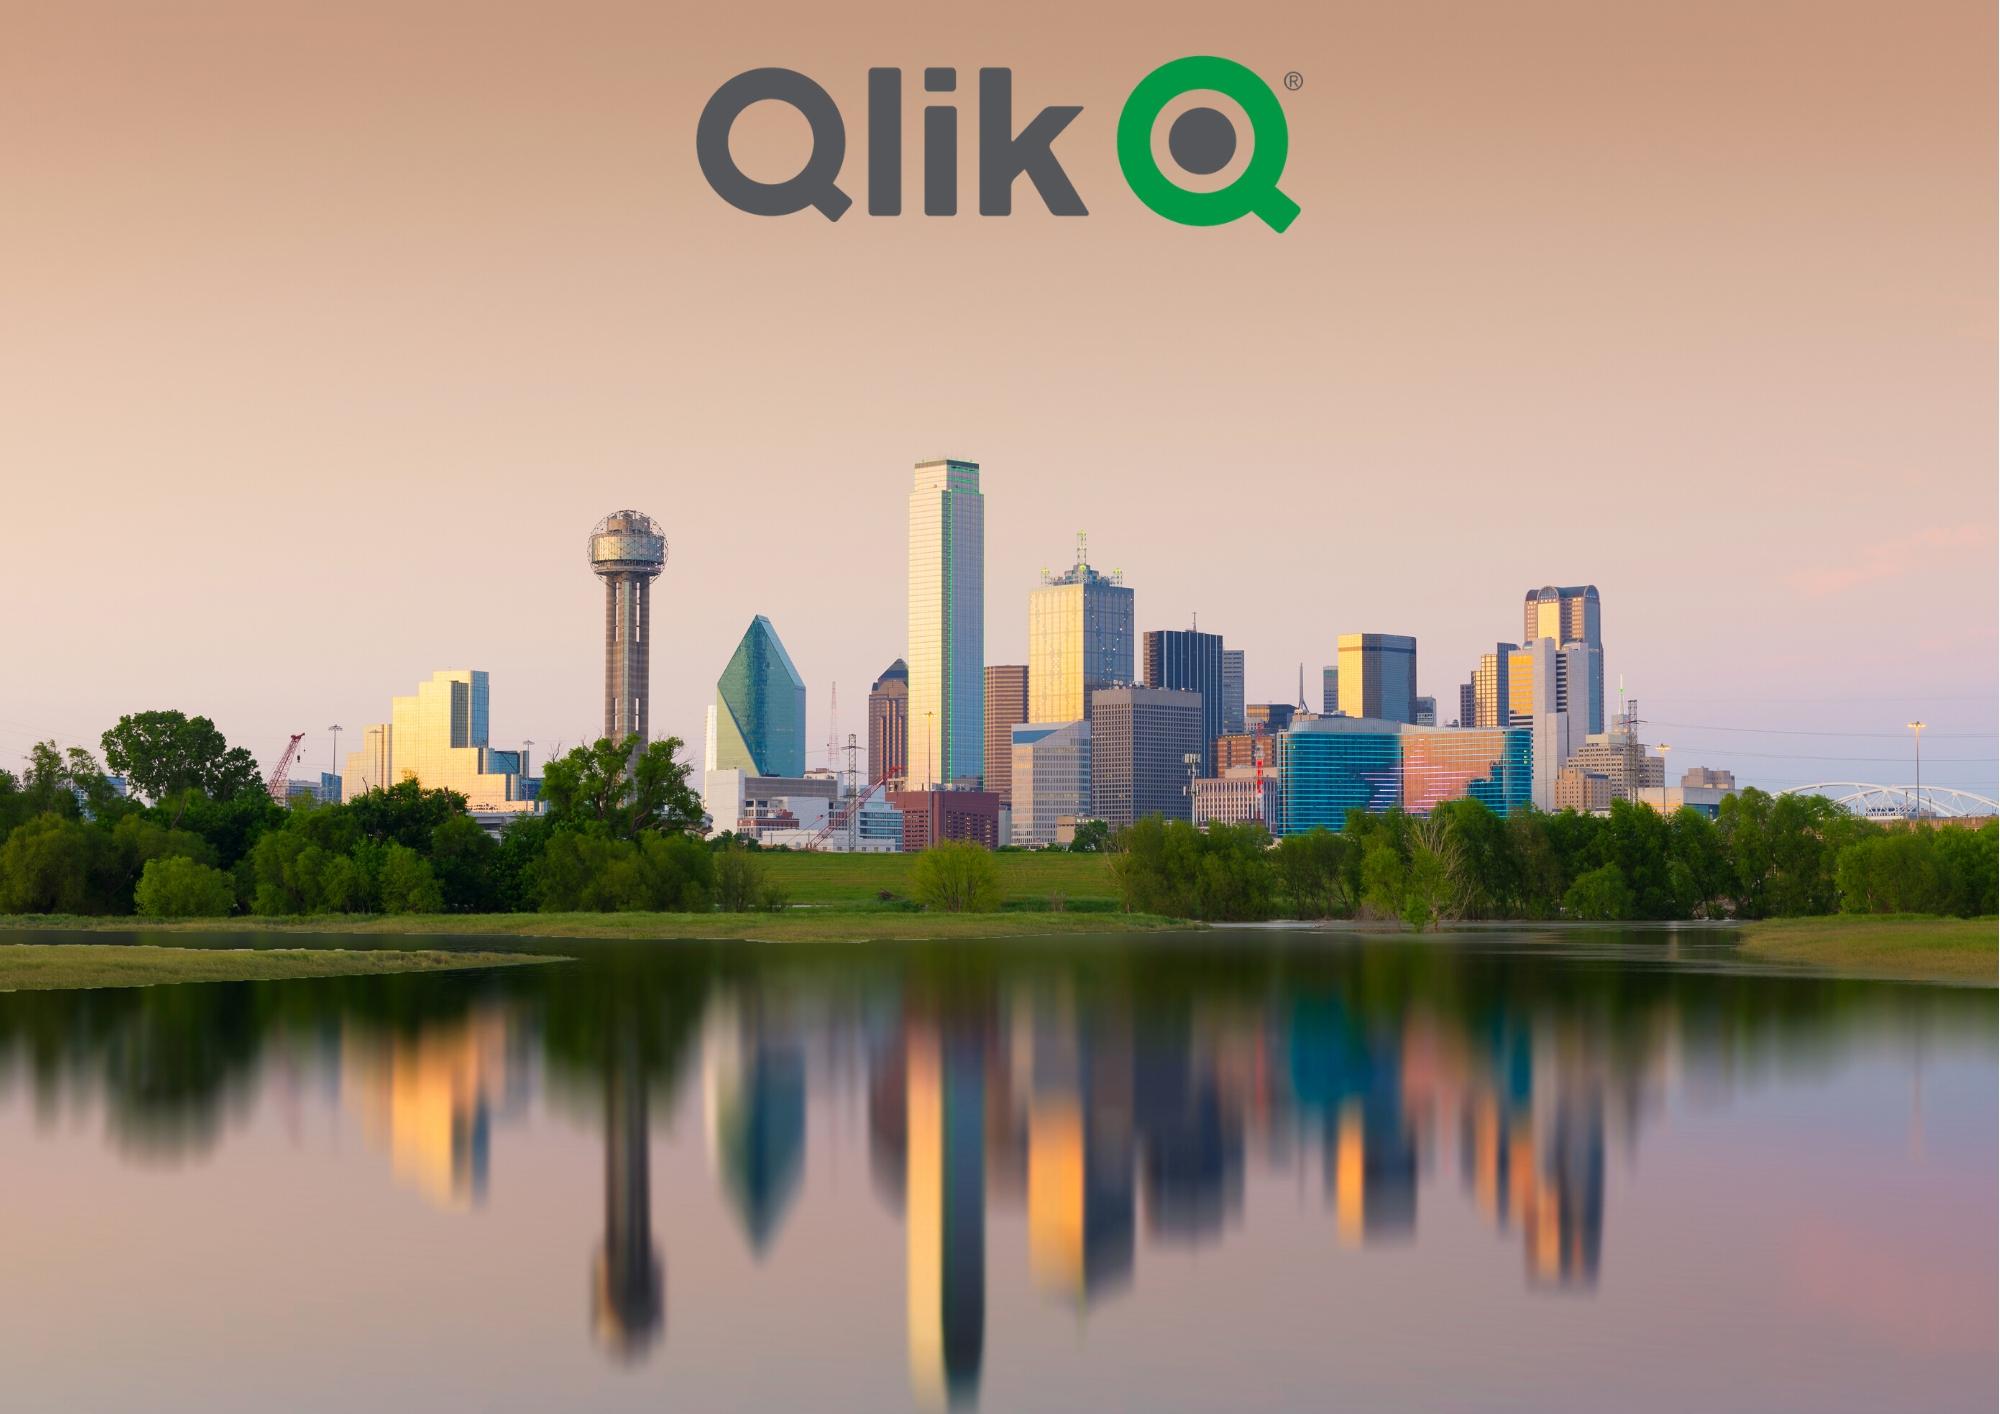 website event listing images - Qlik Dallas